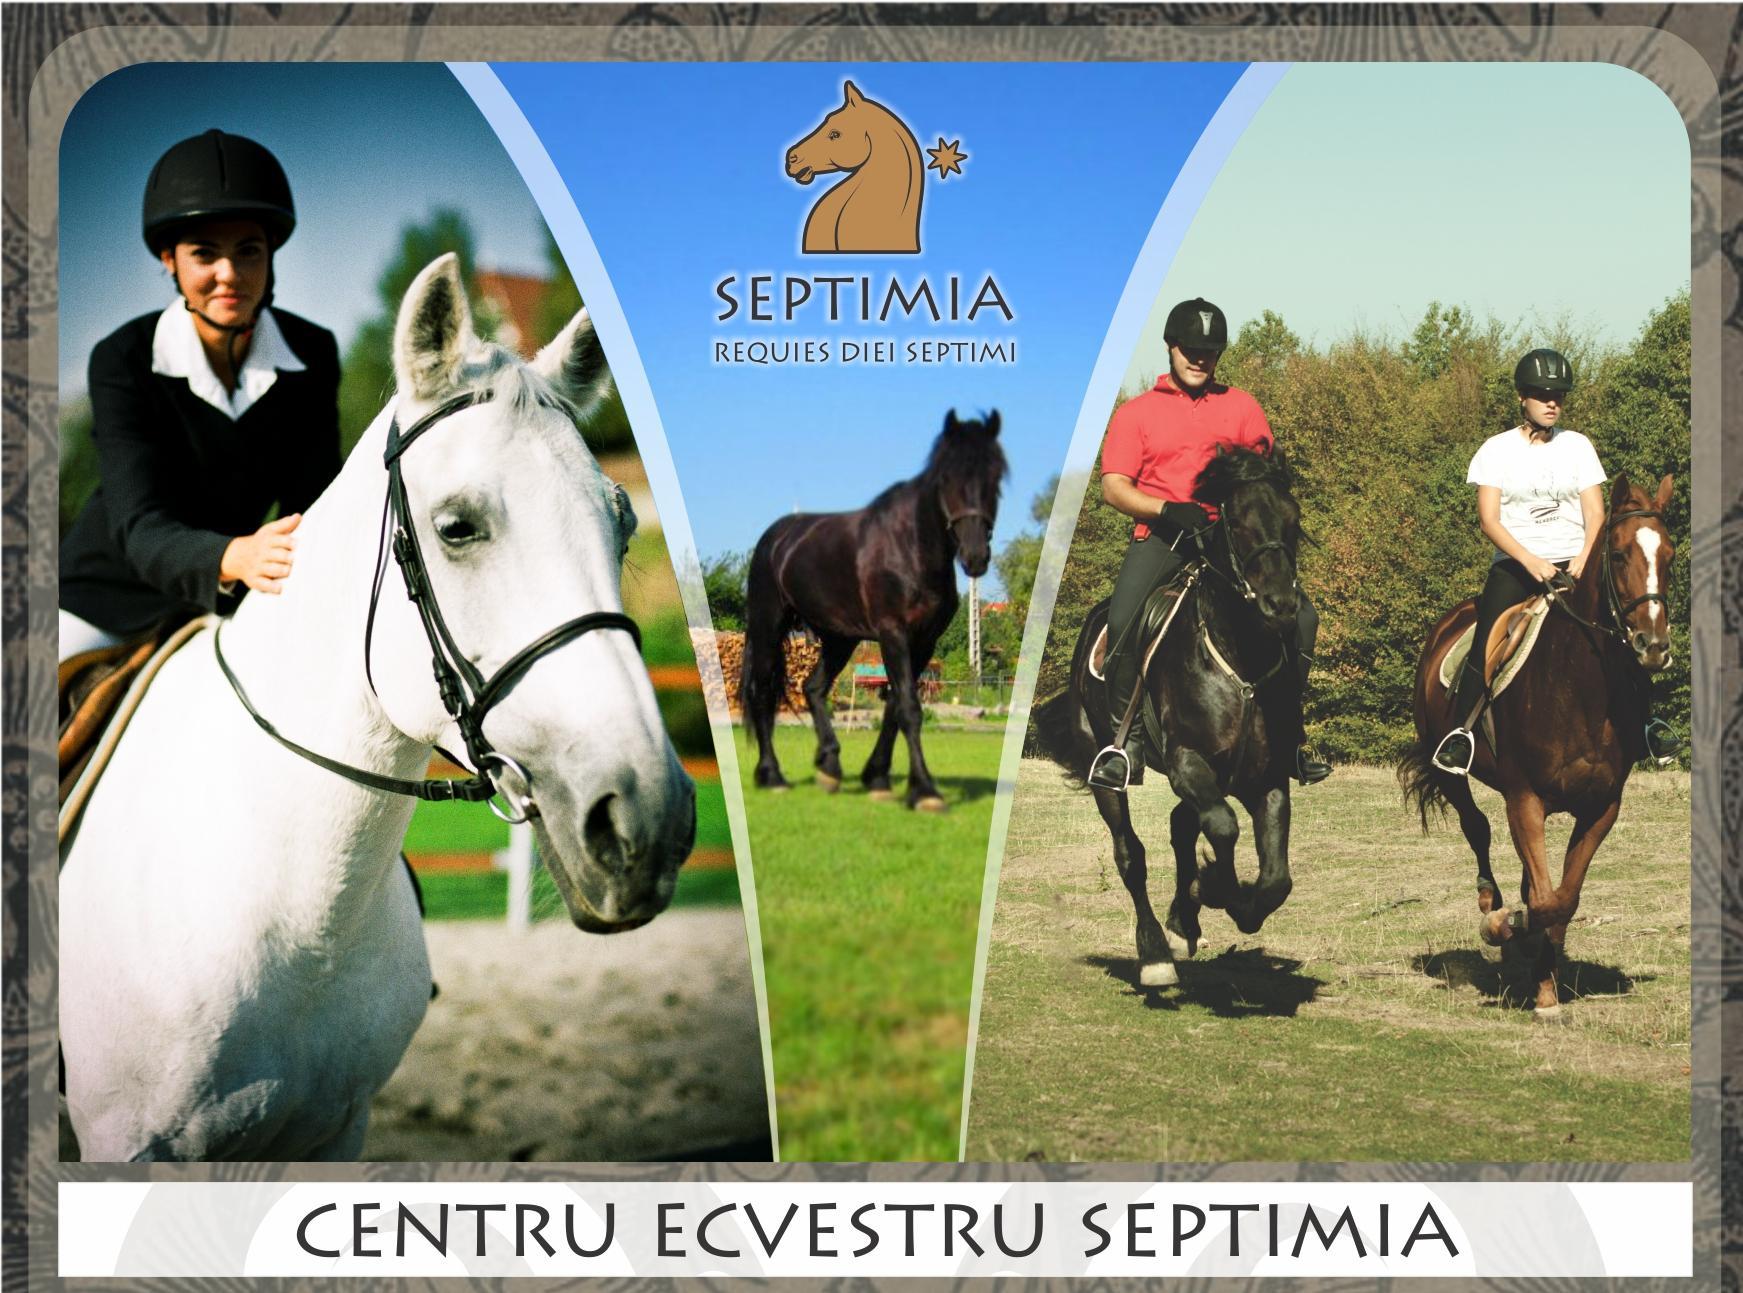 CENTRUL ECVESTRU SEPTIMIA, ODORHEIU SECUIESC, HARGHITA